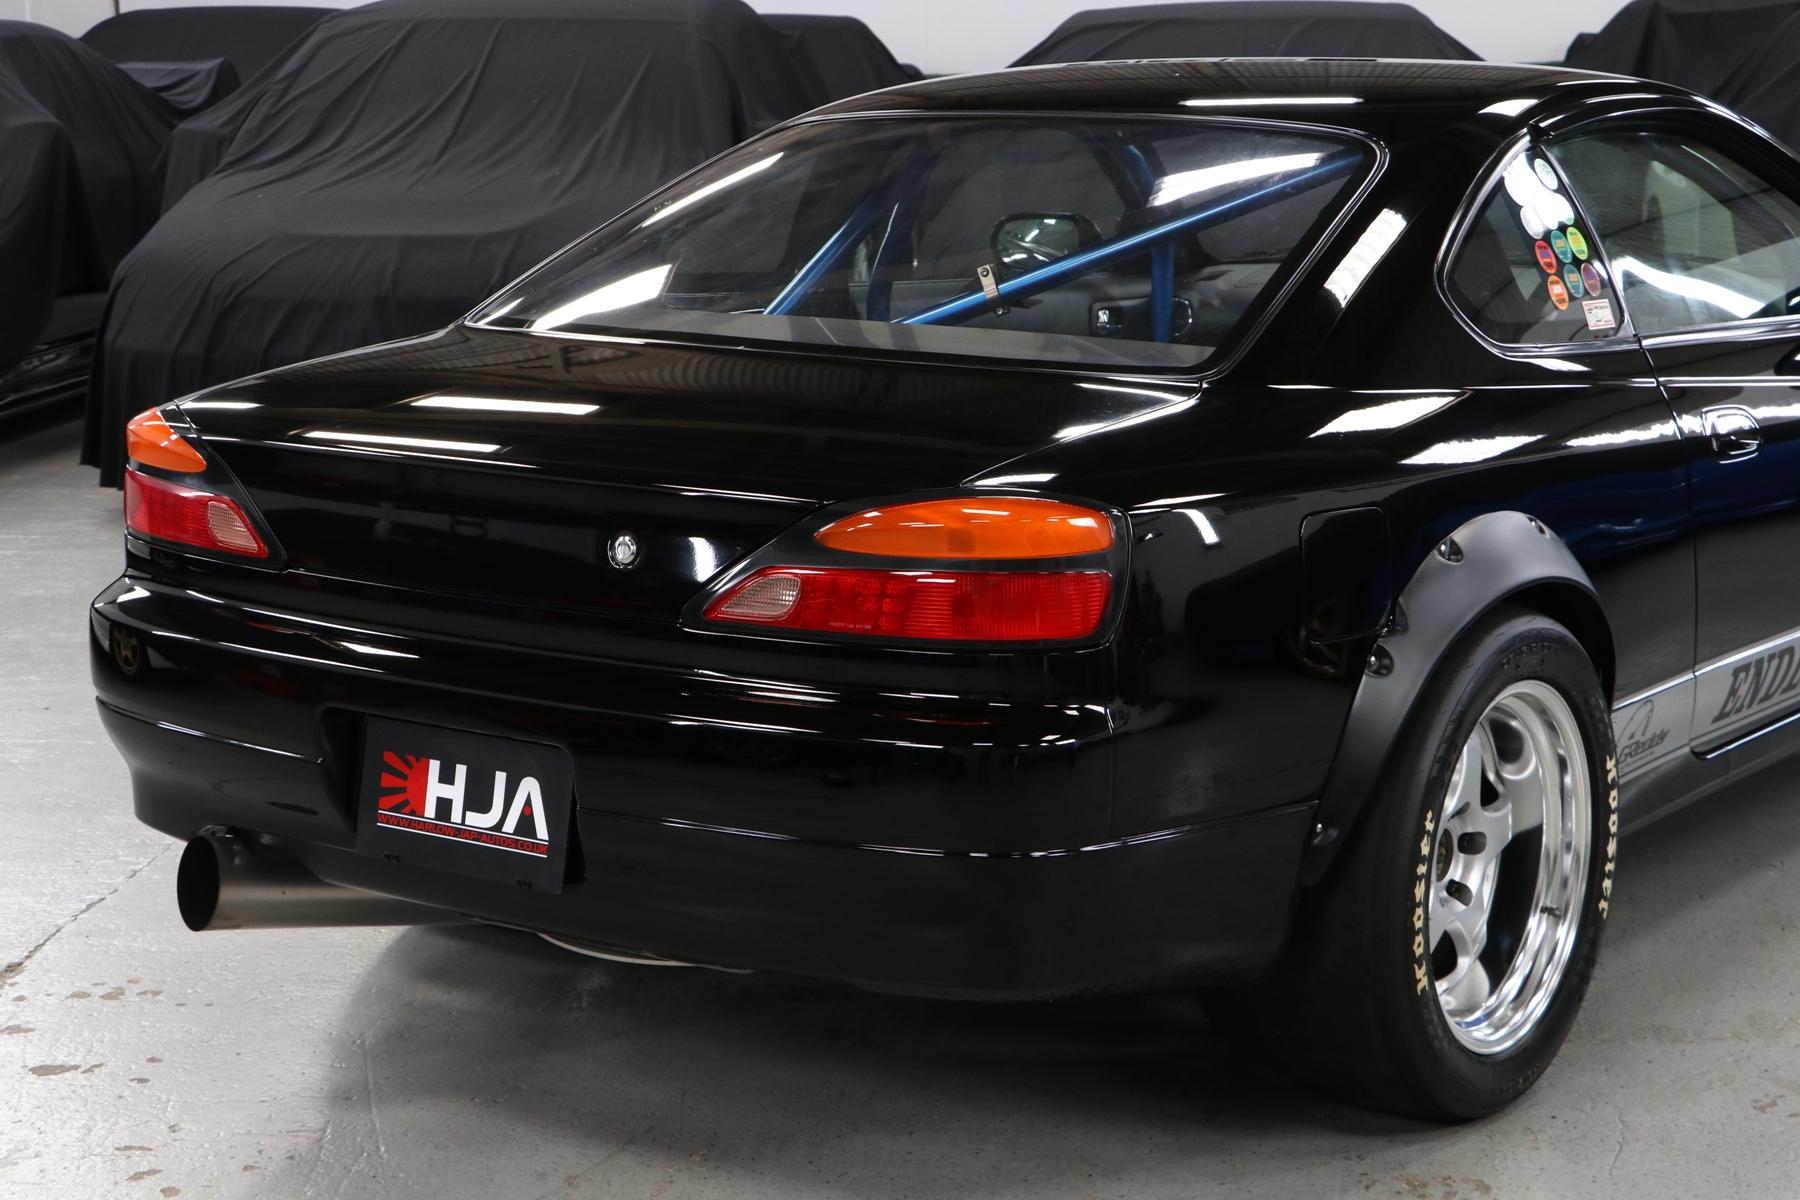 HJA355.020.JPG